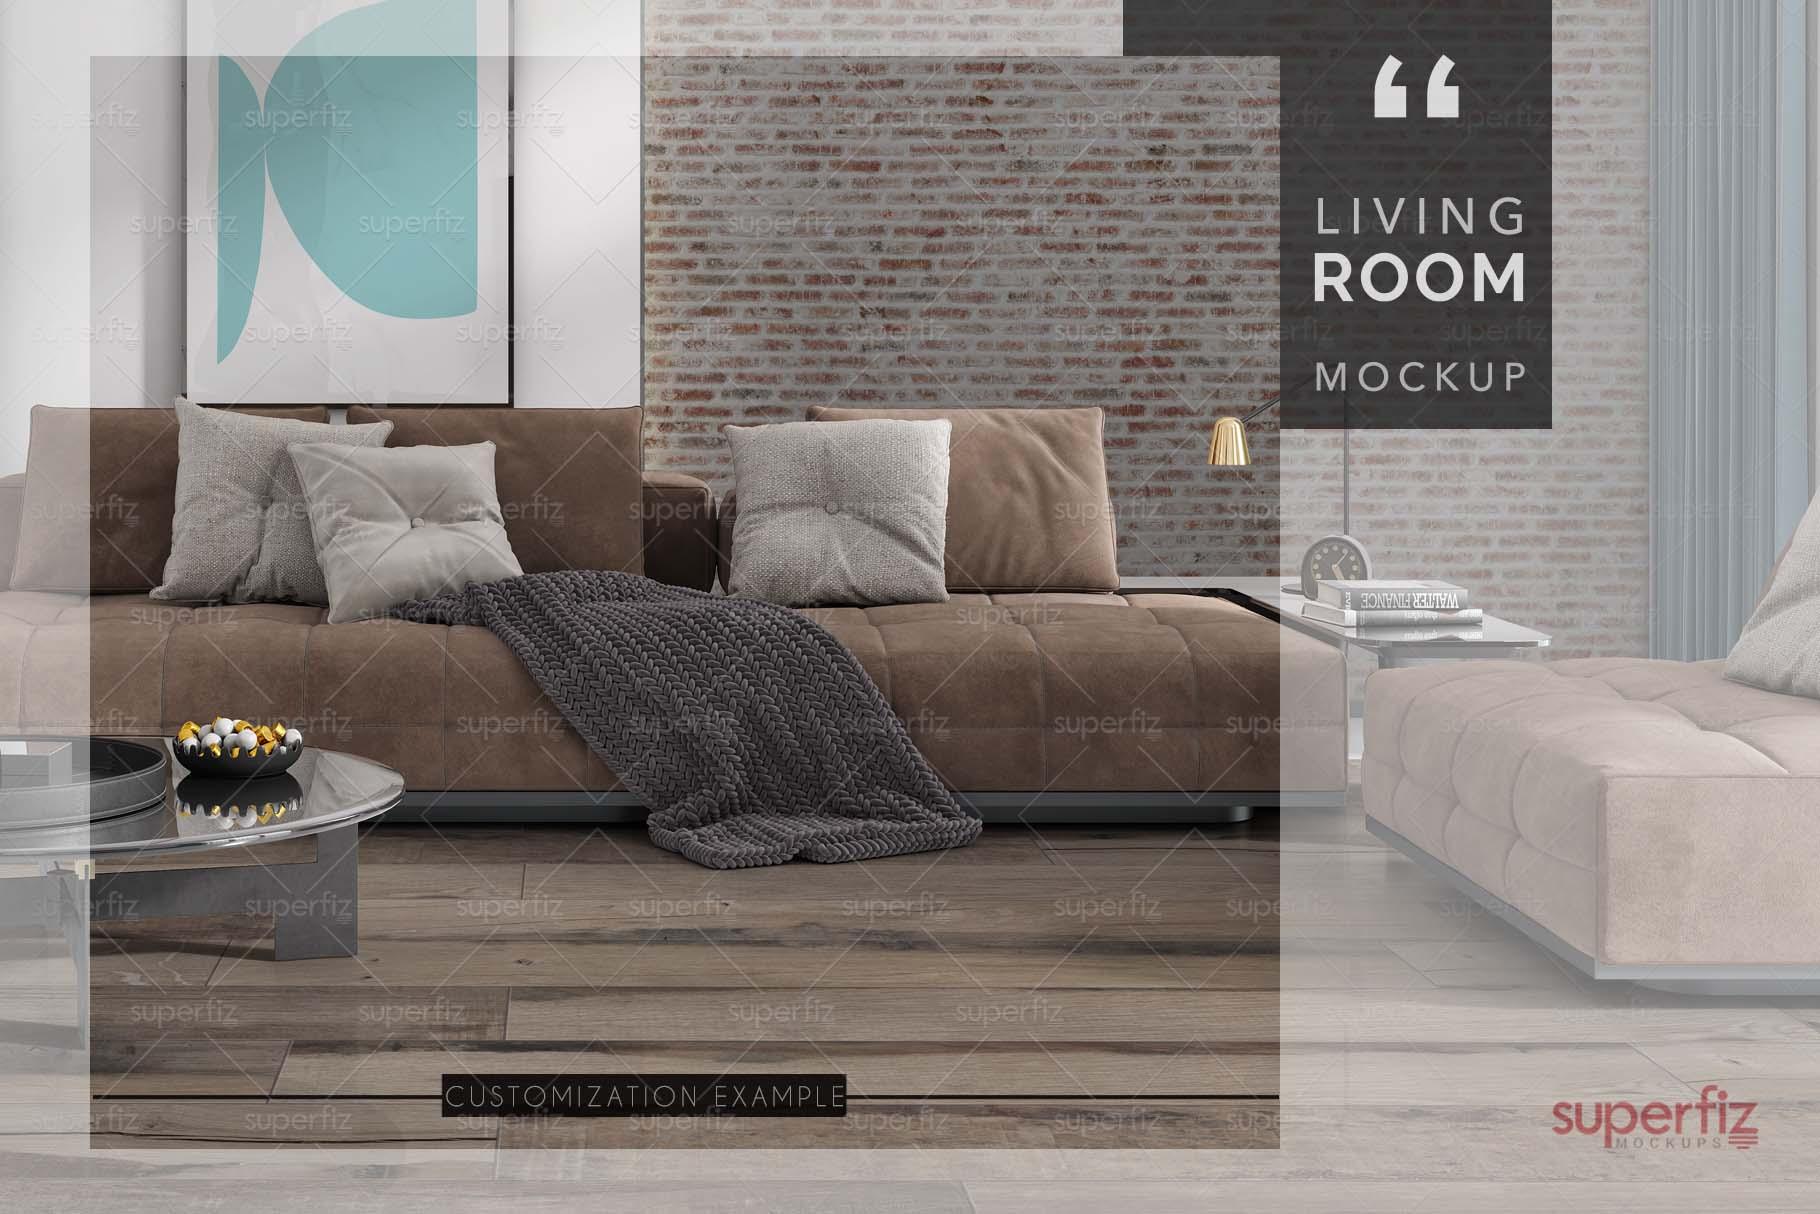 Blank Floor and Wall PSD Mockup Livingroom SM75 example image 7